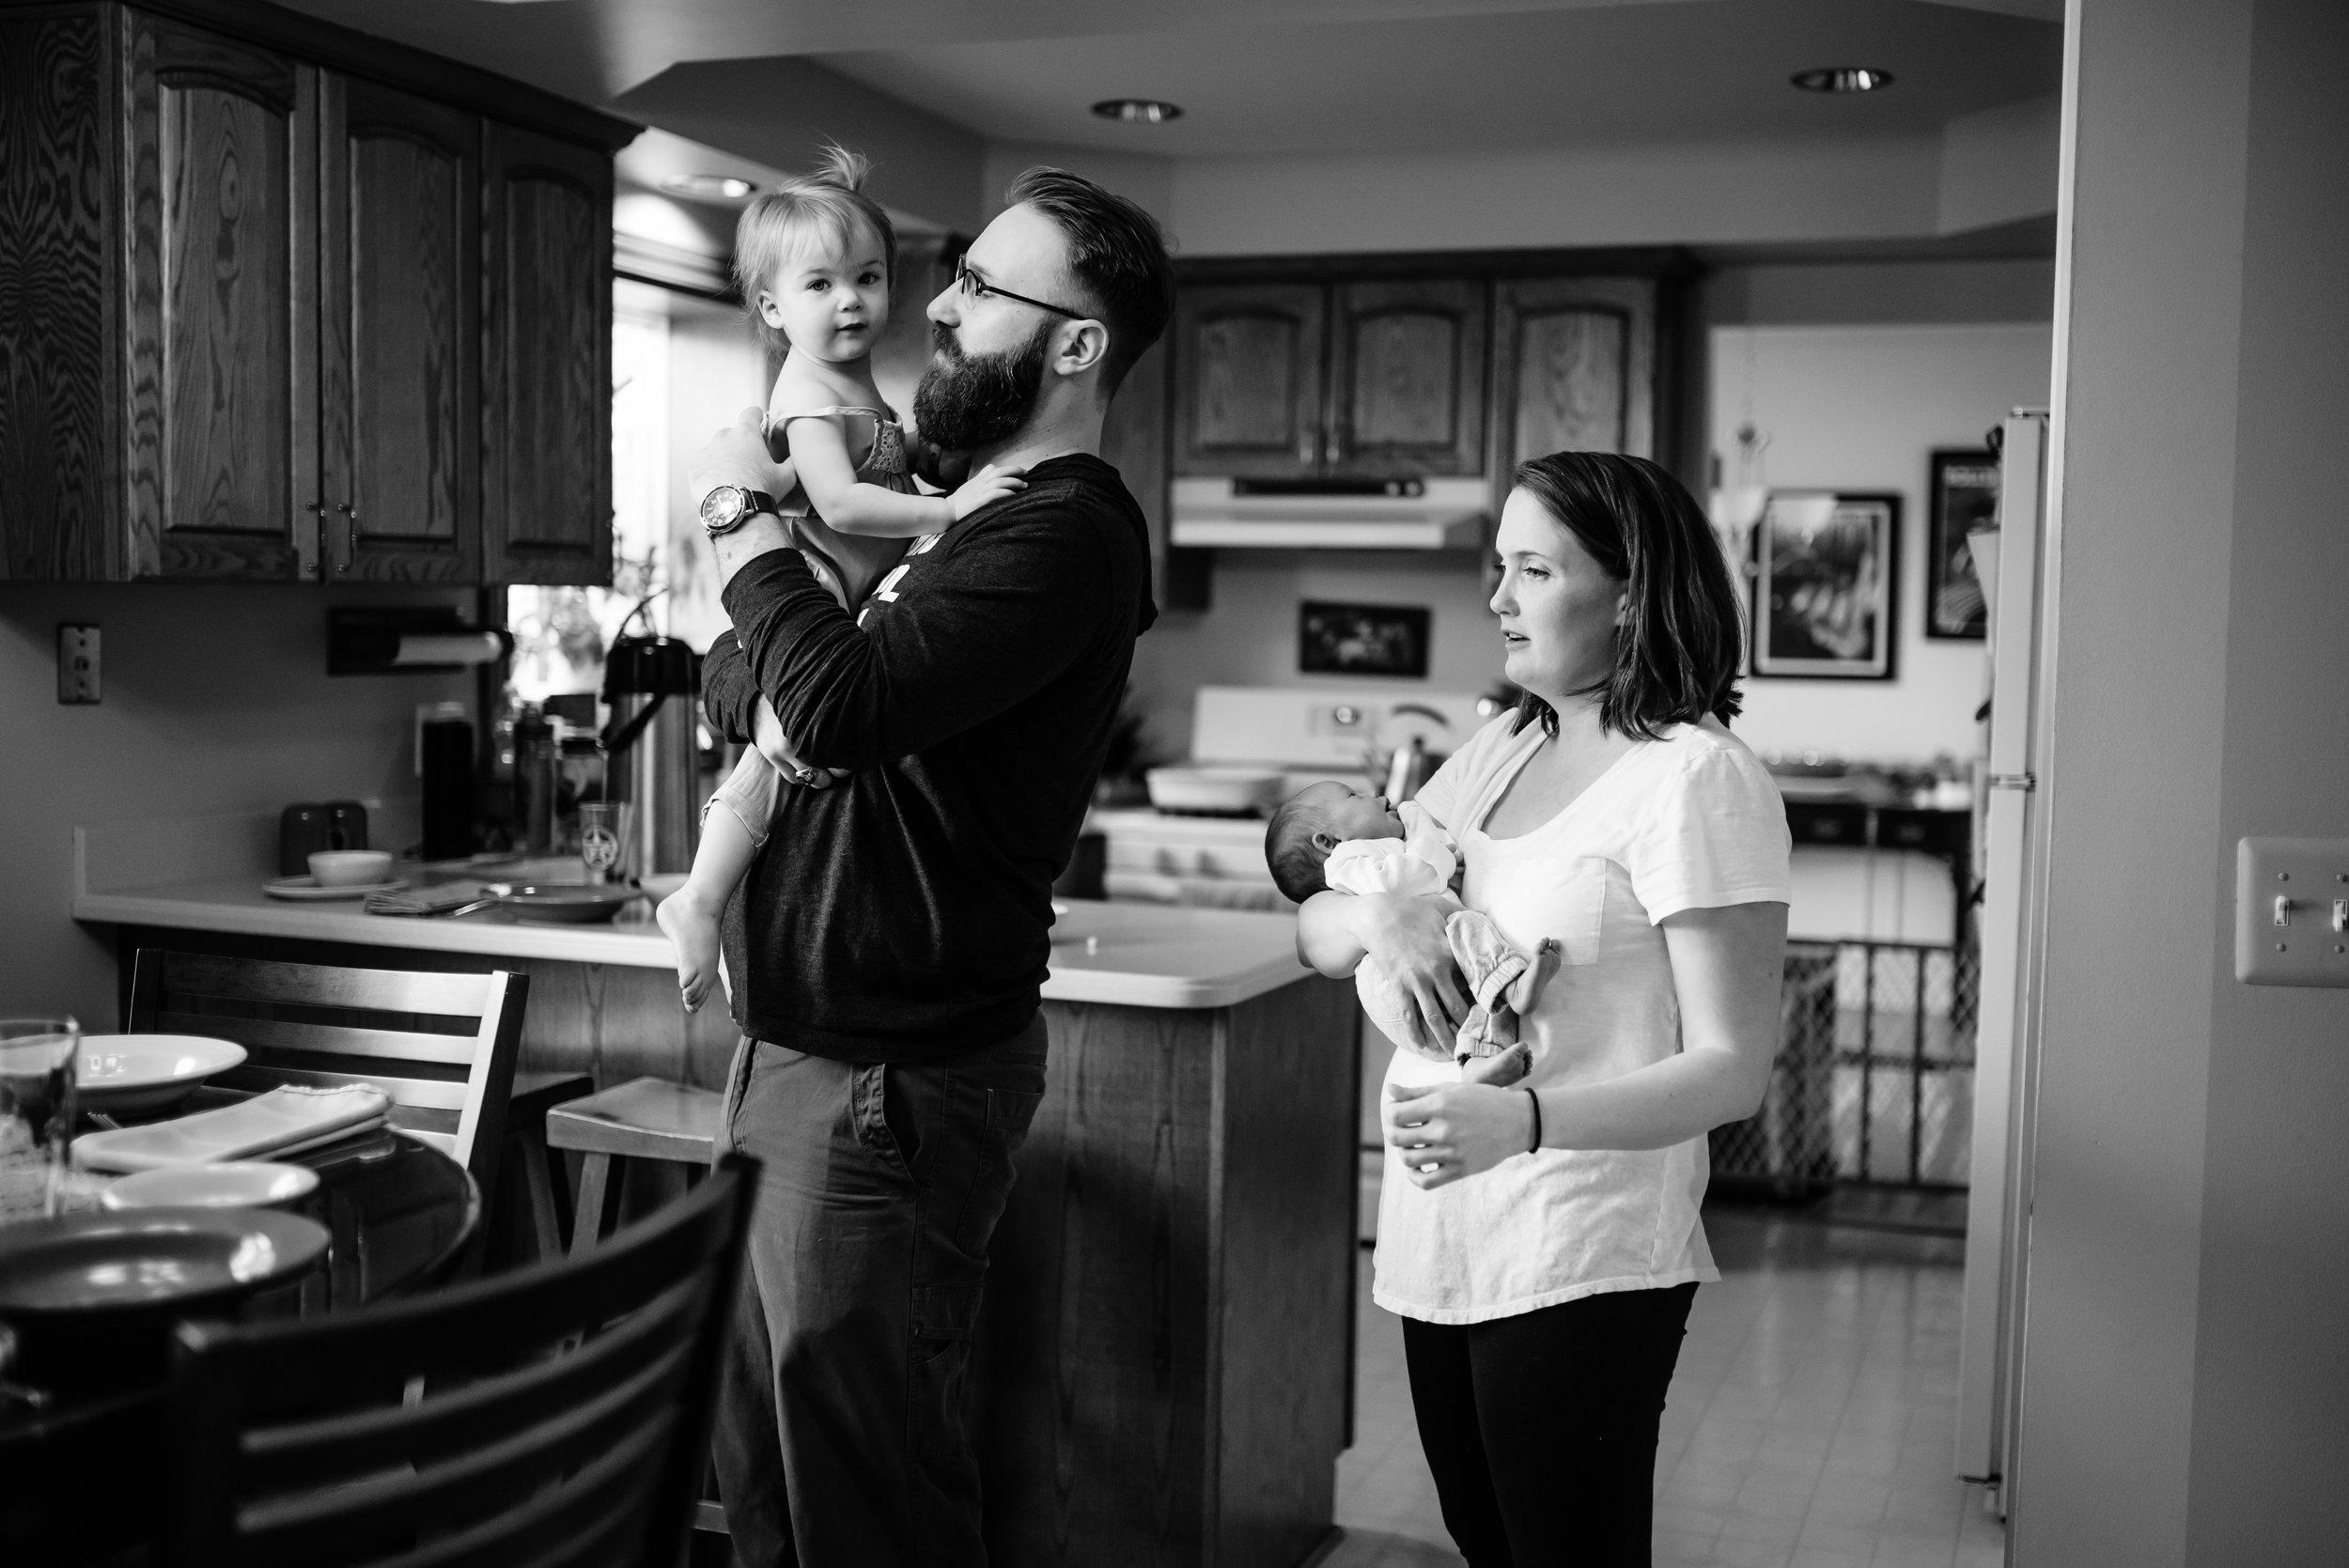 Mom and Dad hold children in kitchen